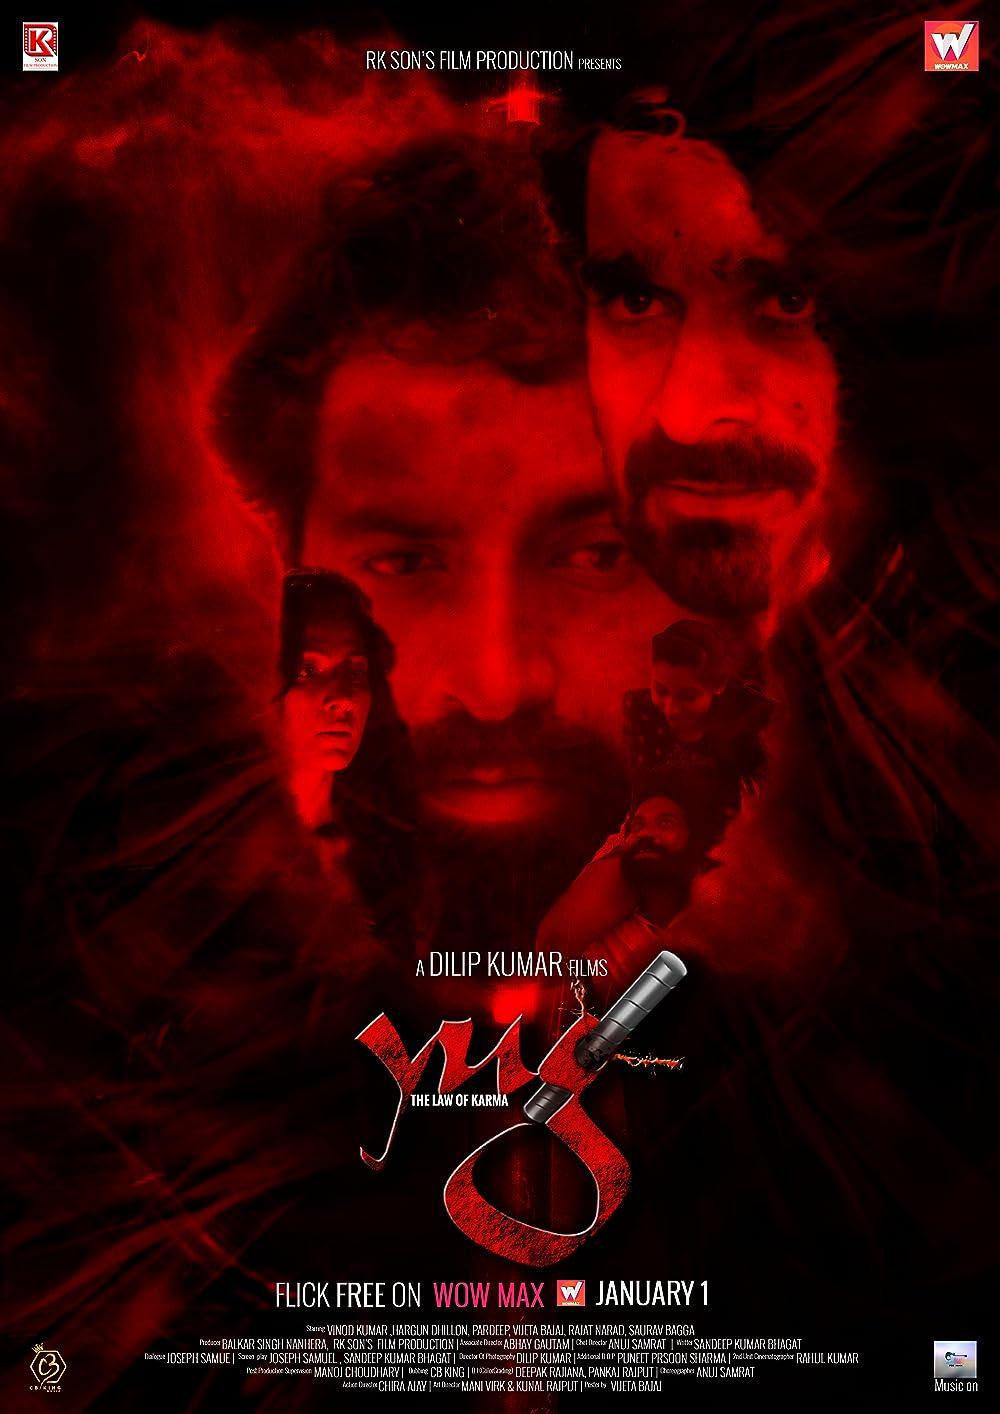 Yug The Law Of Karm (2021) Hindi 720p HDRip x264 AAC 1.4GB Download